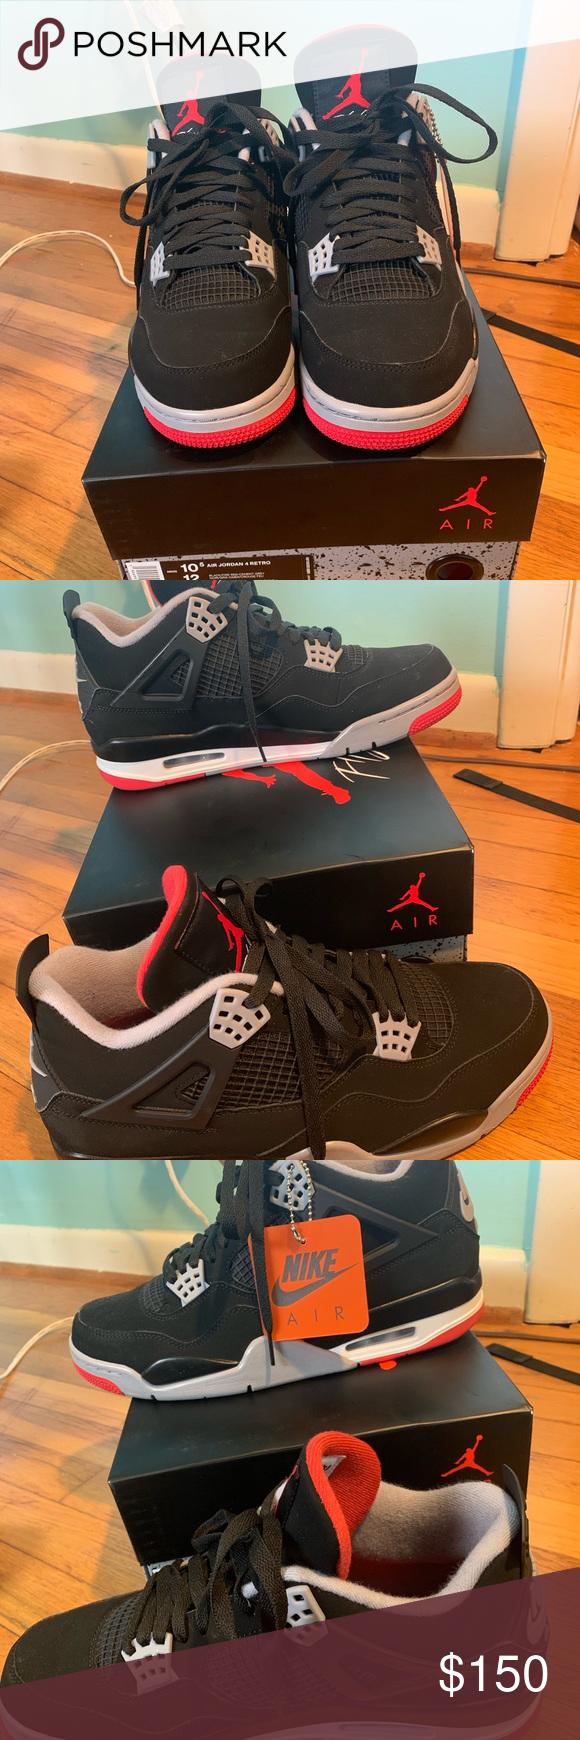 Air Jordan 4 Bred Size 10.5 2019 Retro